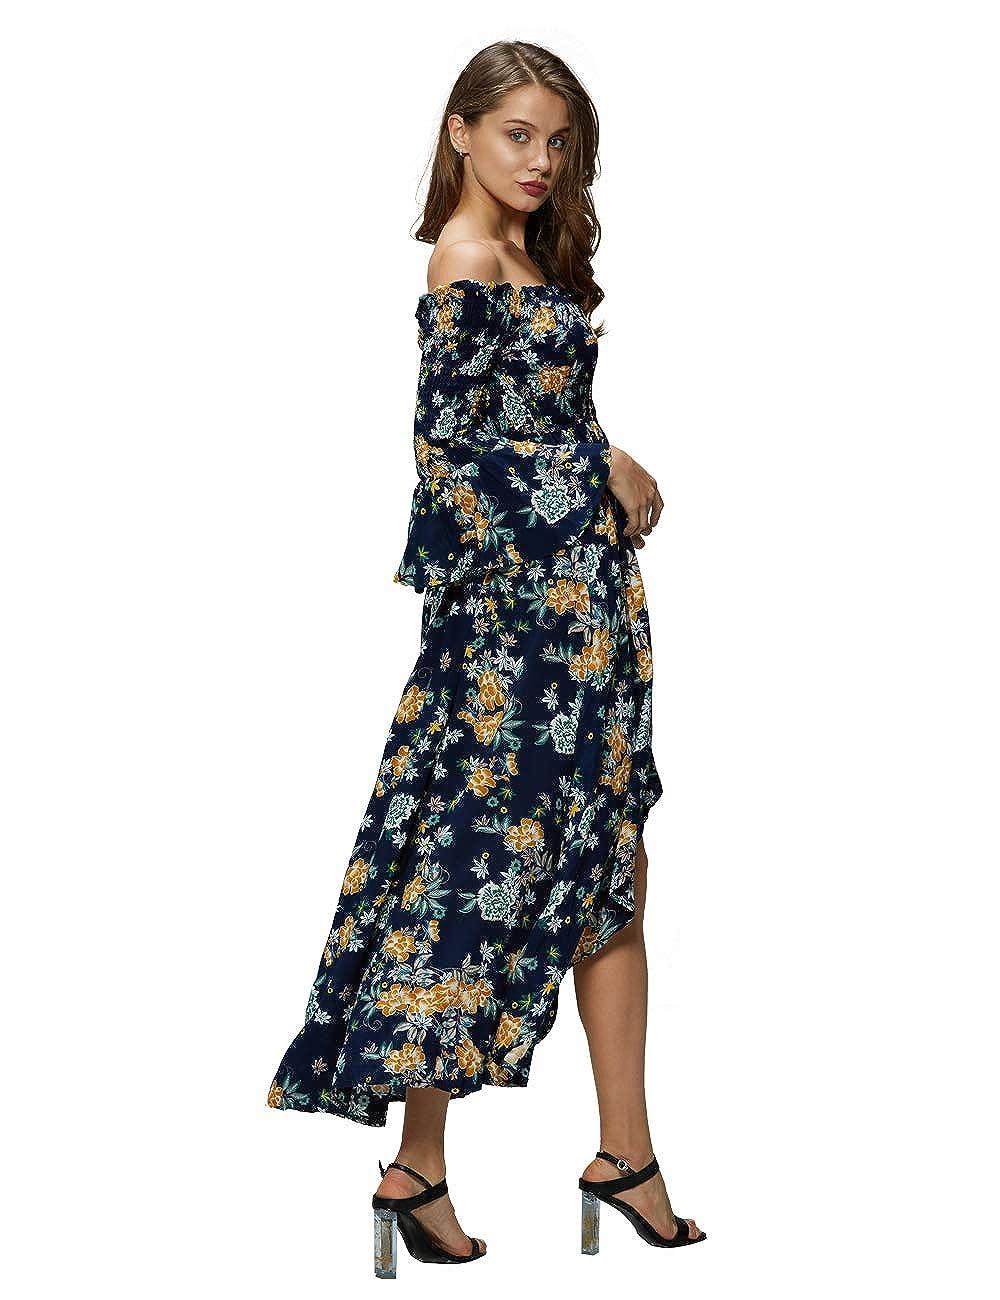 2ddd2ac882 Petite Summer Beach Dresses